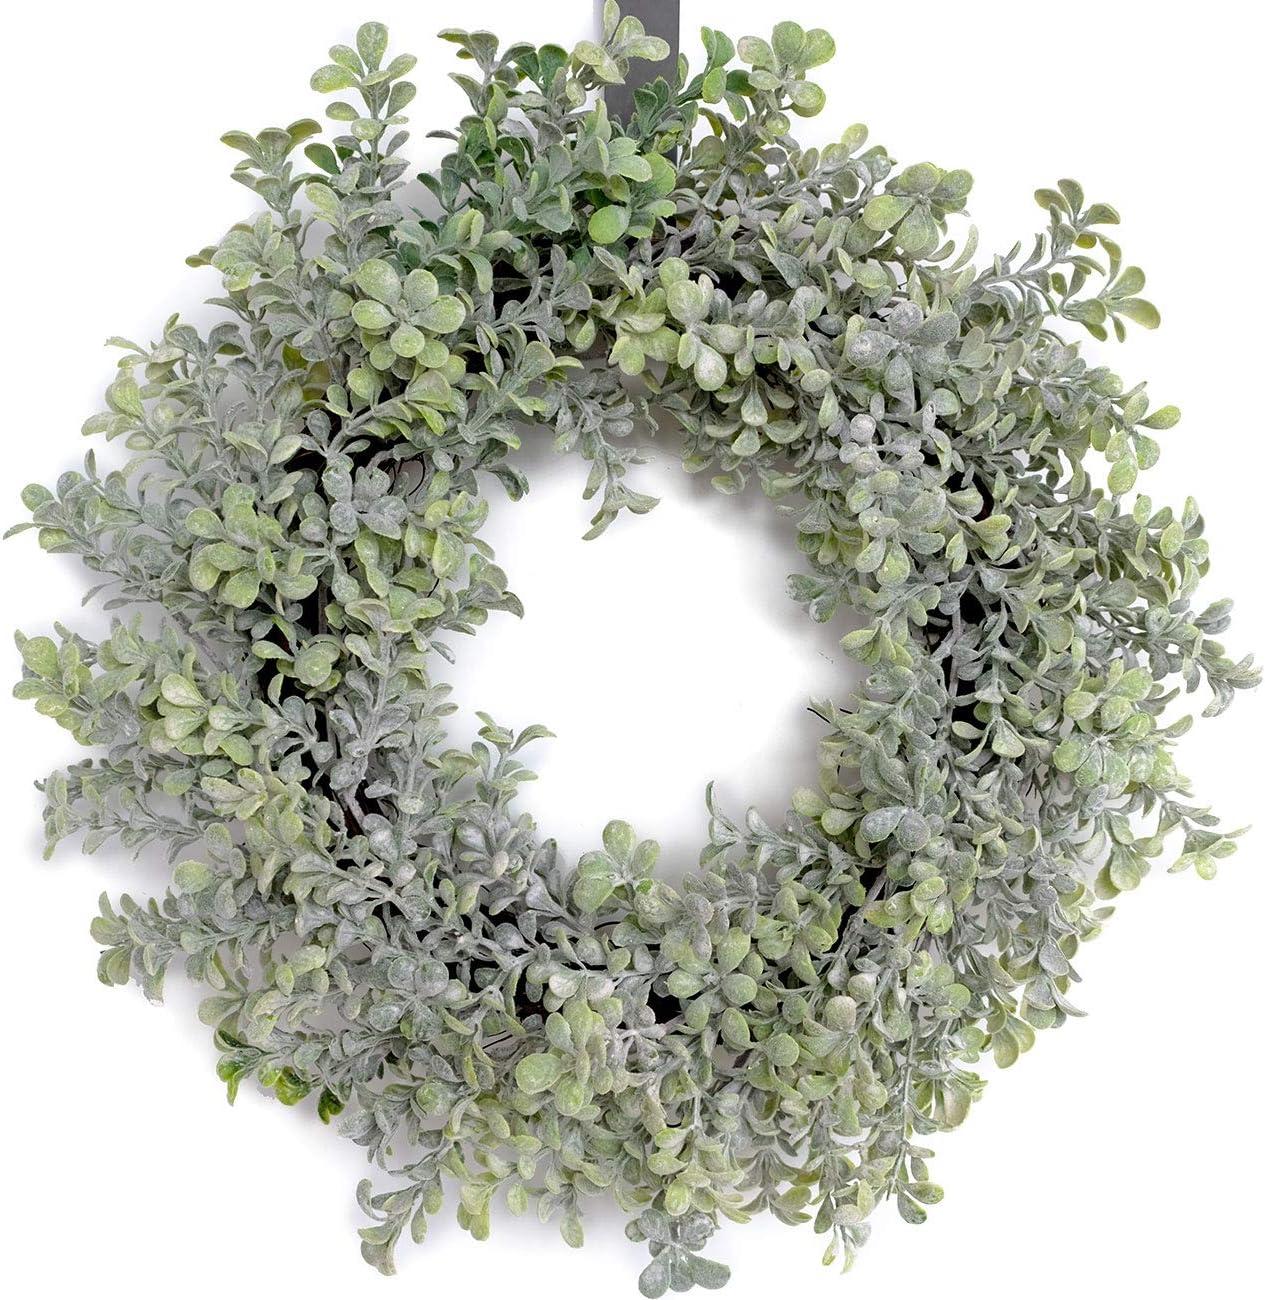 Bibelot 18 Inch Artificial Green Leaves Wreath Spring Wreath Farmhouse Decor for Front Door Wedding Wall Home Decor…